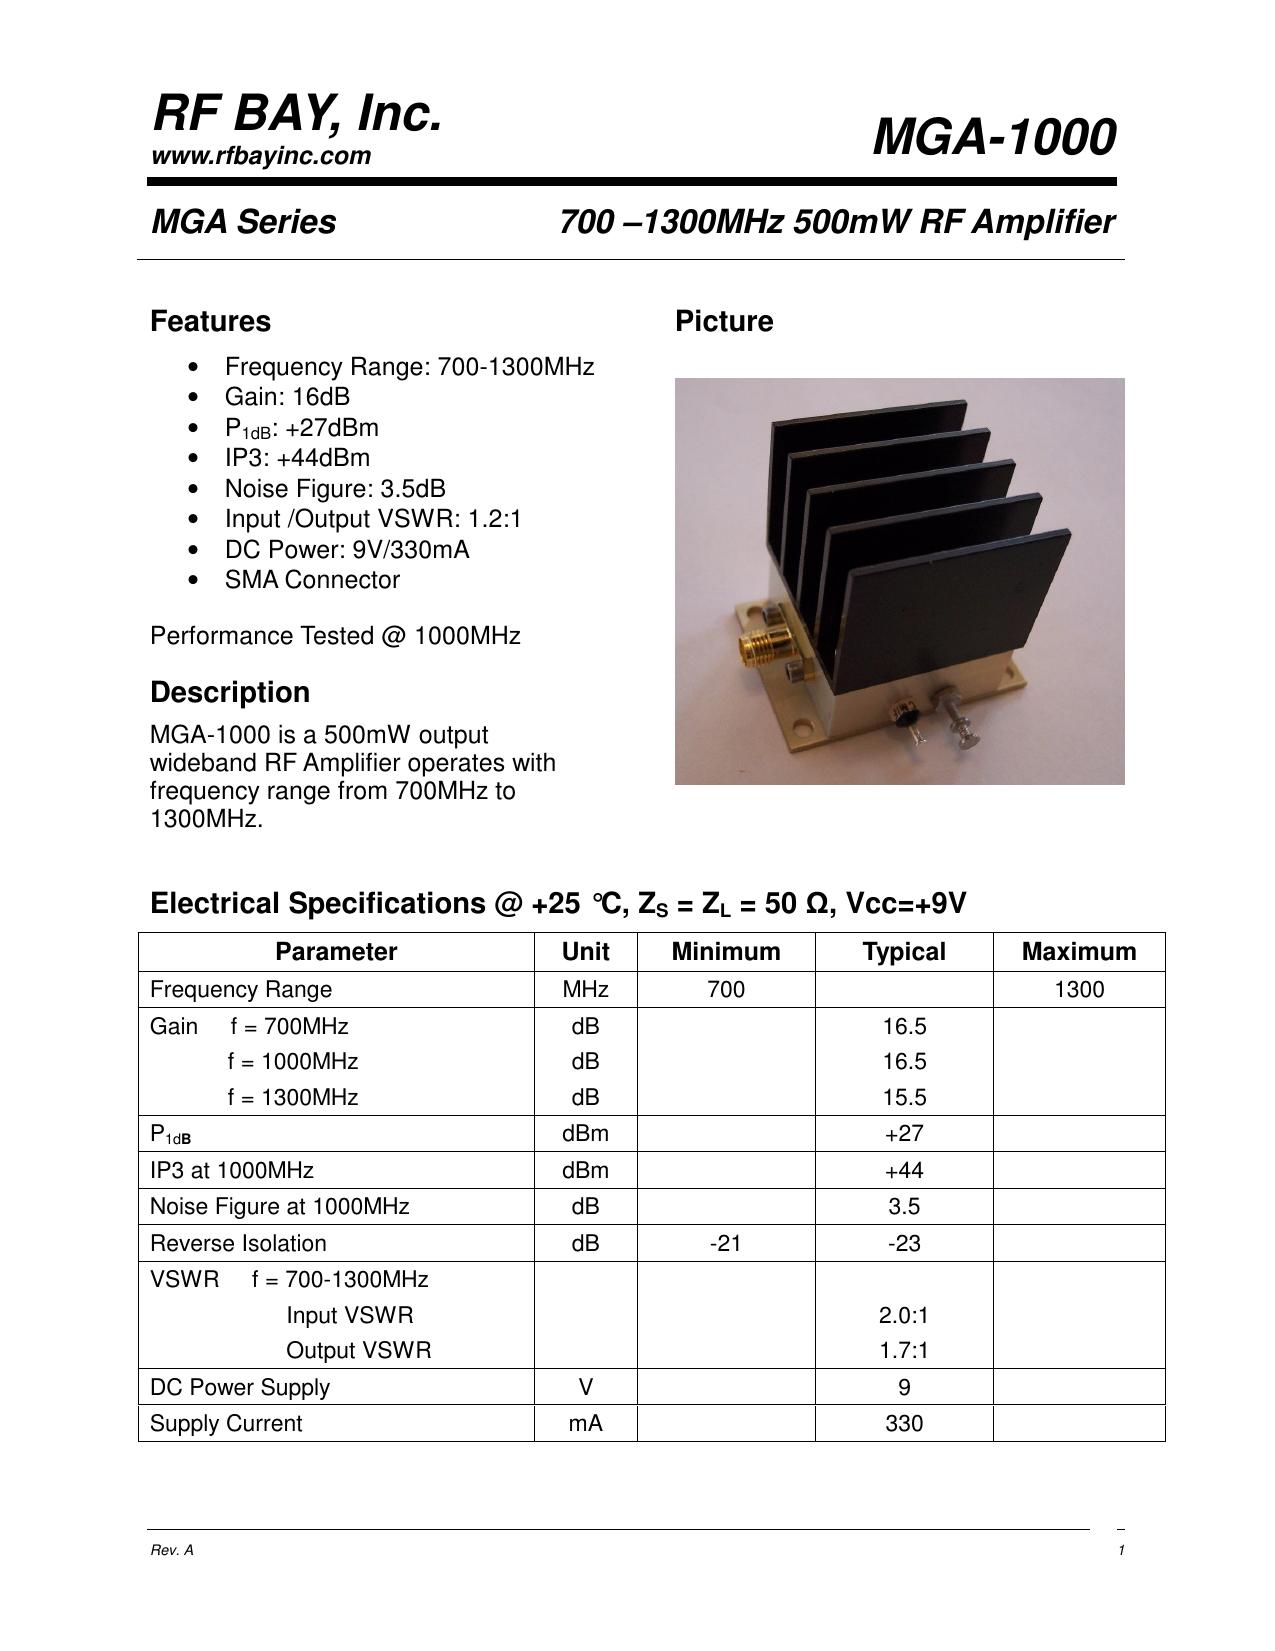 RF BAY, Inc  MGA-1000 | manualzz com